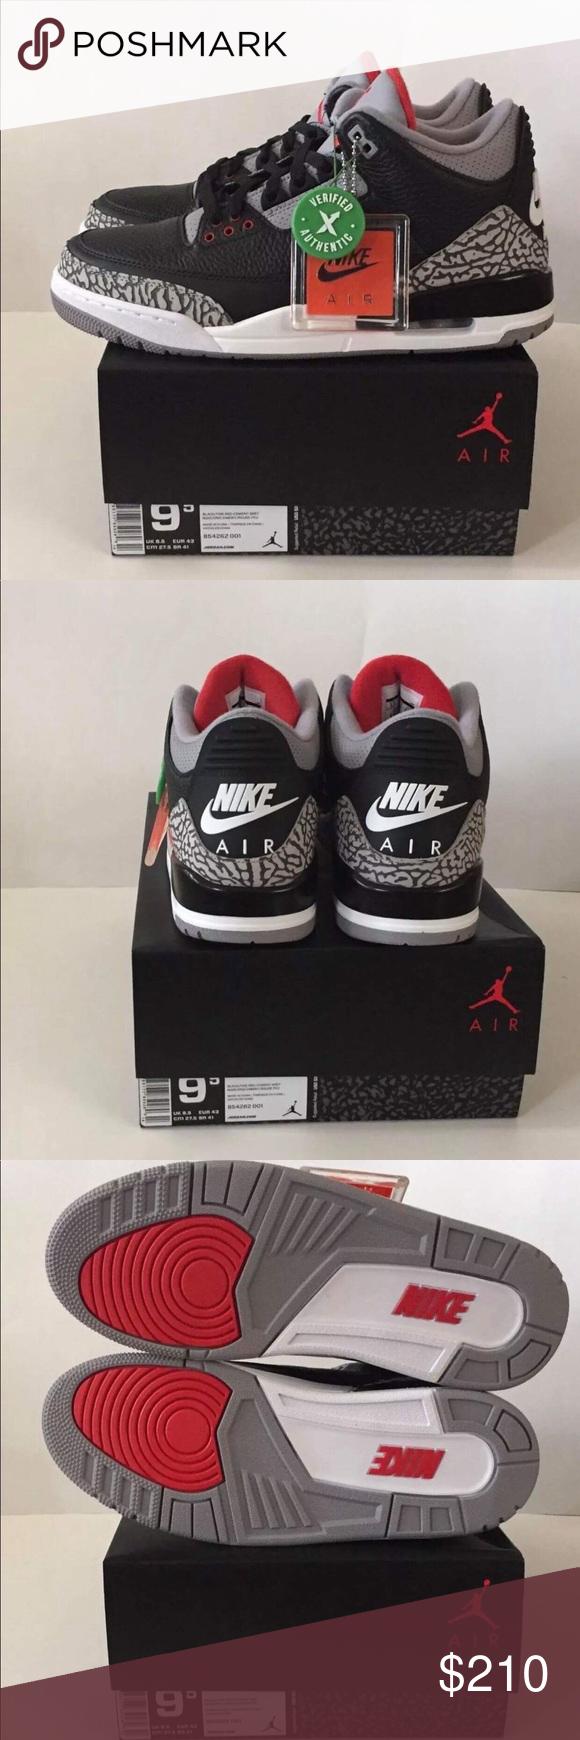 677830c09593 Air Jordan 3 Retro Black Cement Nike OG Deadstock Retro Nike OG Black  Cements New In Box with Receipt StockX Verified Box Nike HangTag All  Original!!